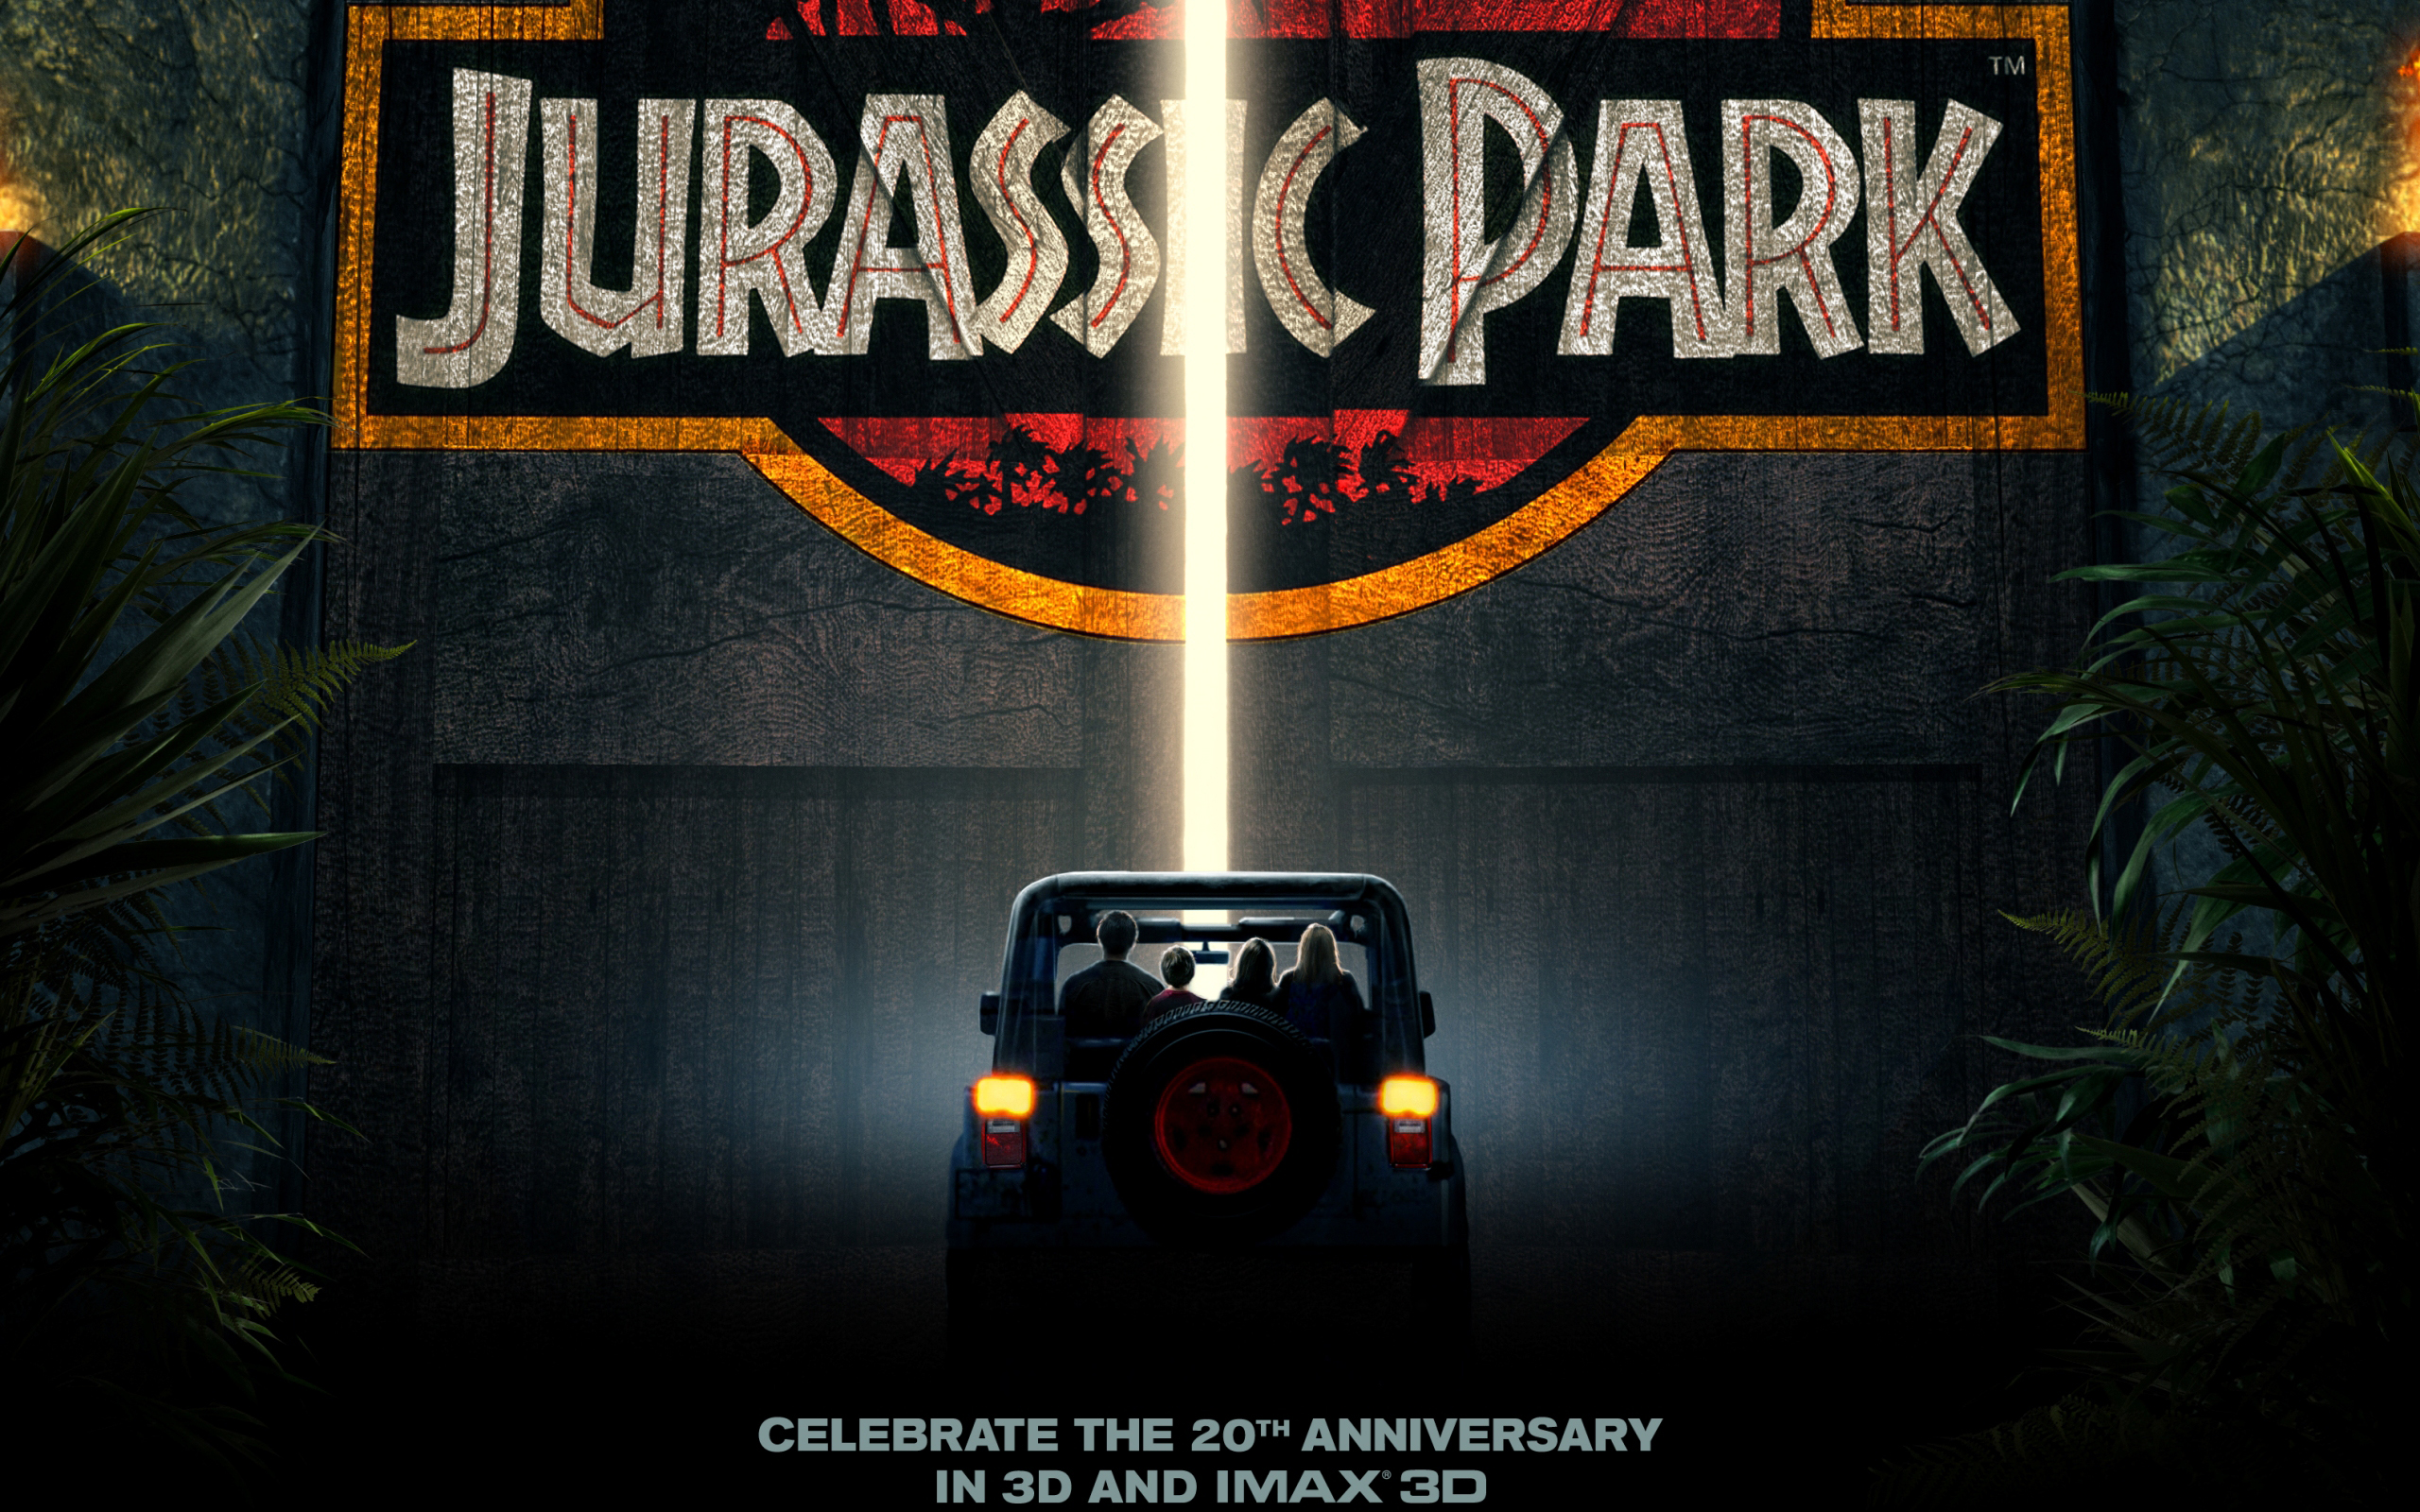 Inspirational Quotes Wallpaper Hd Free Download Jurassic Park Wallpaper Hd Pixelstalk Net